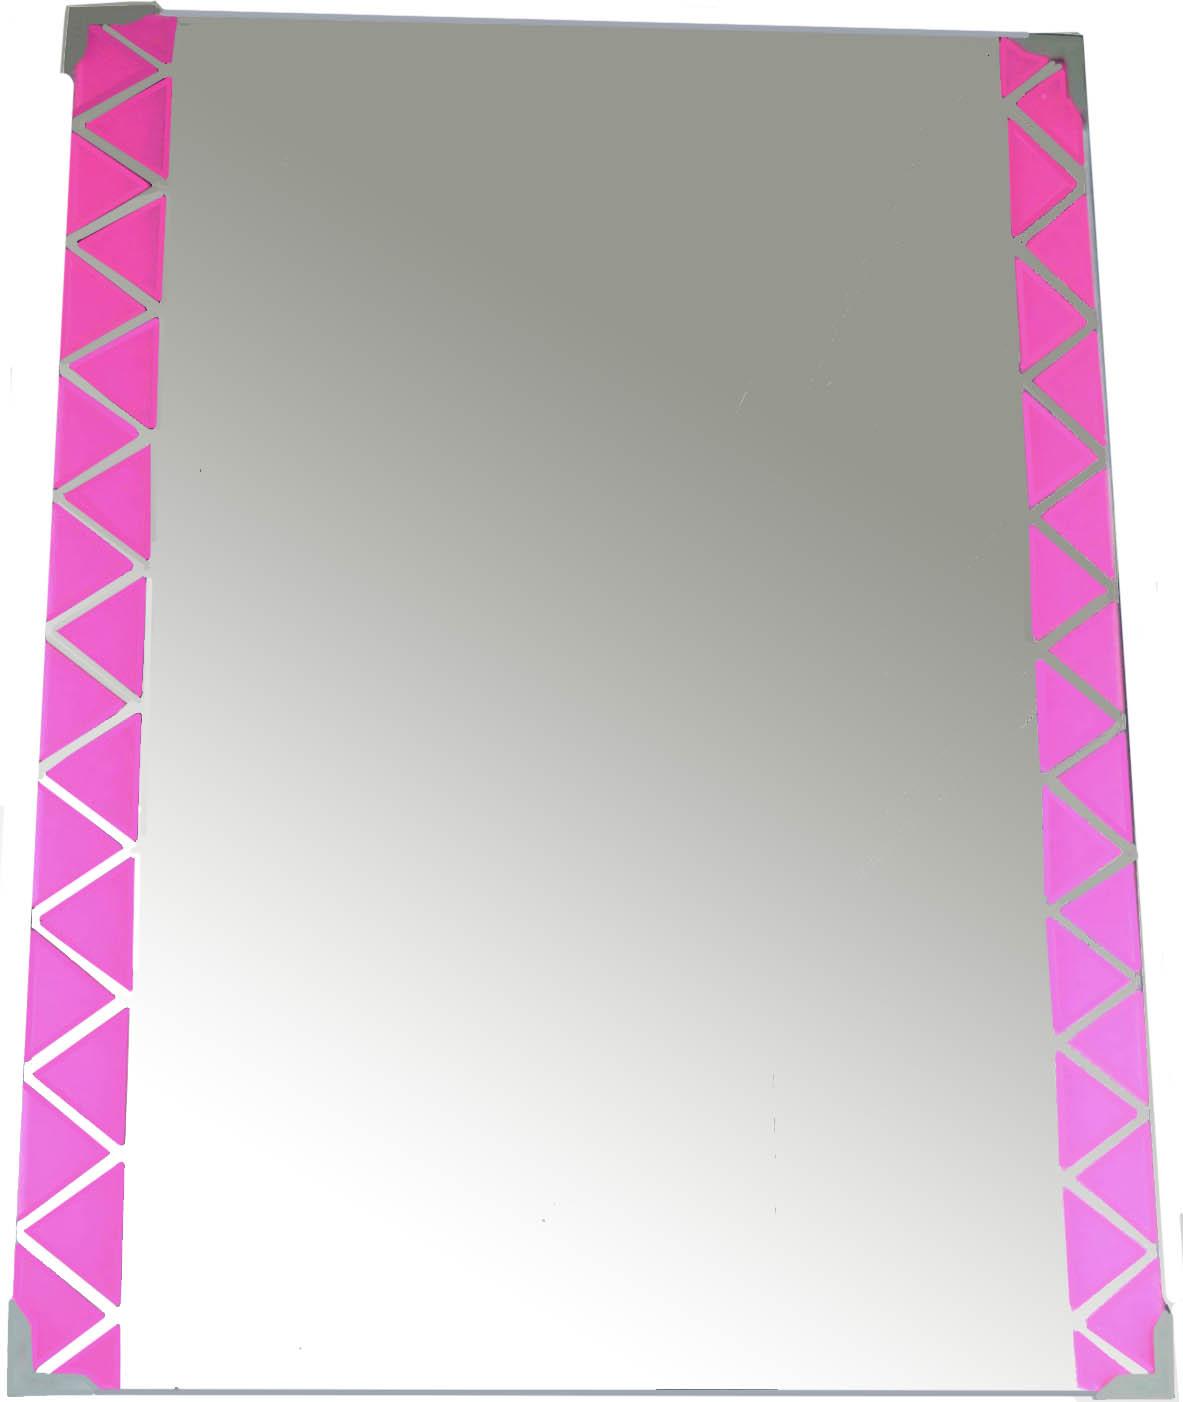 HOMEbase Mirror pink border 60cm x 45 (end 5/8/2020 3:38 PM)